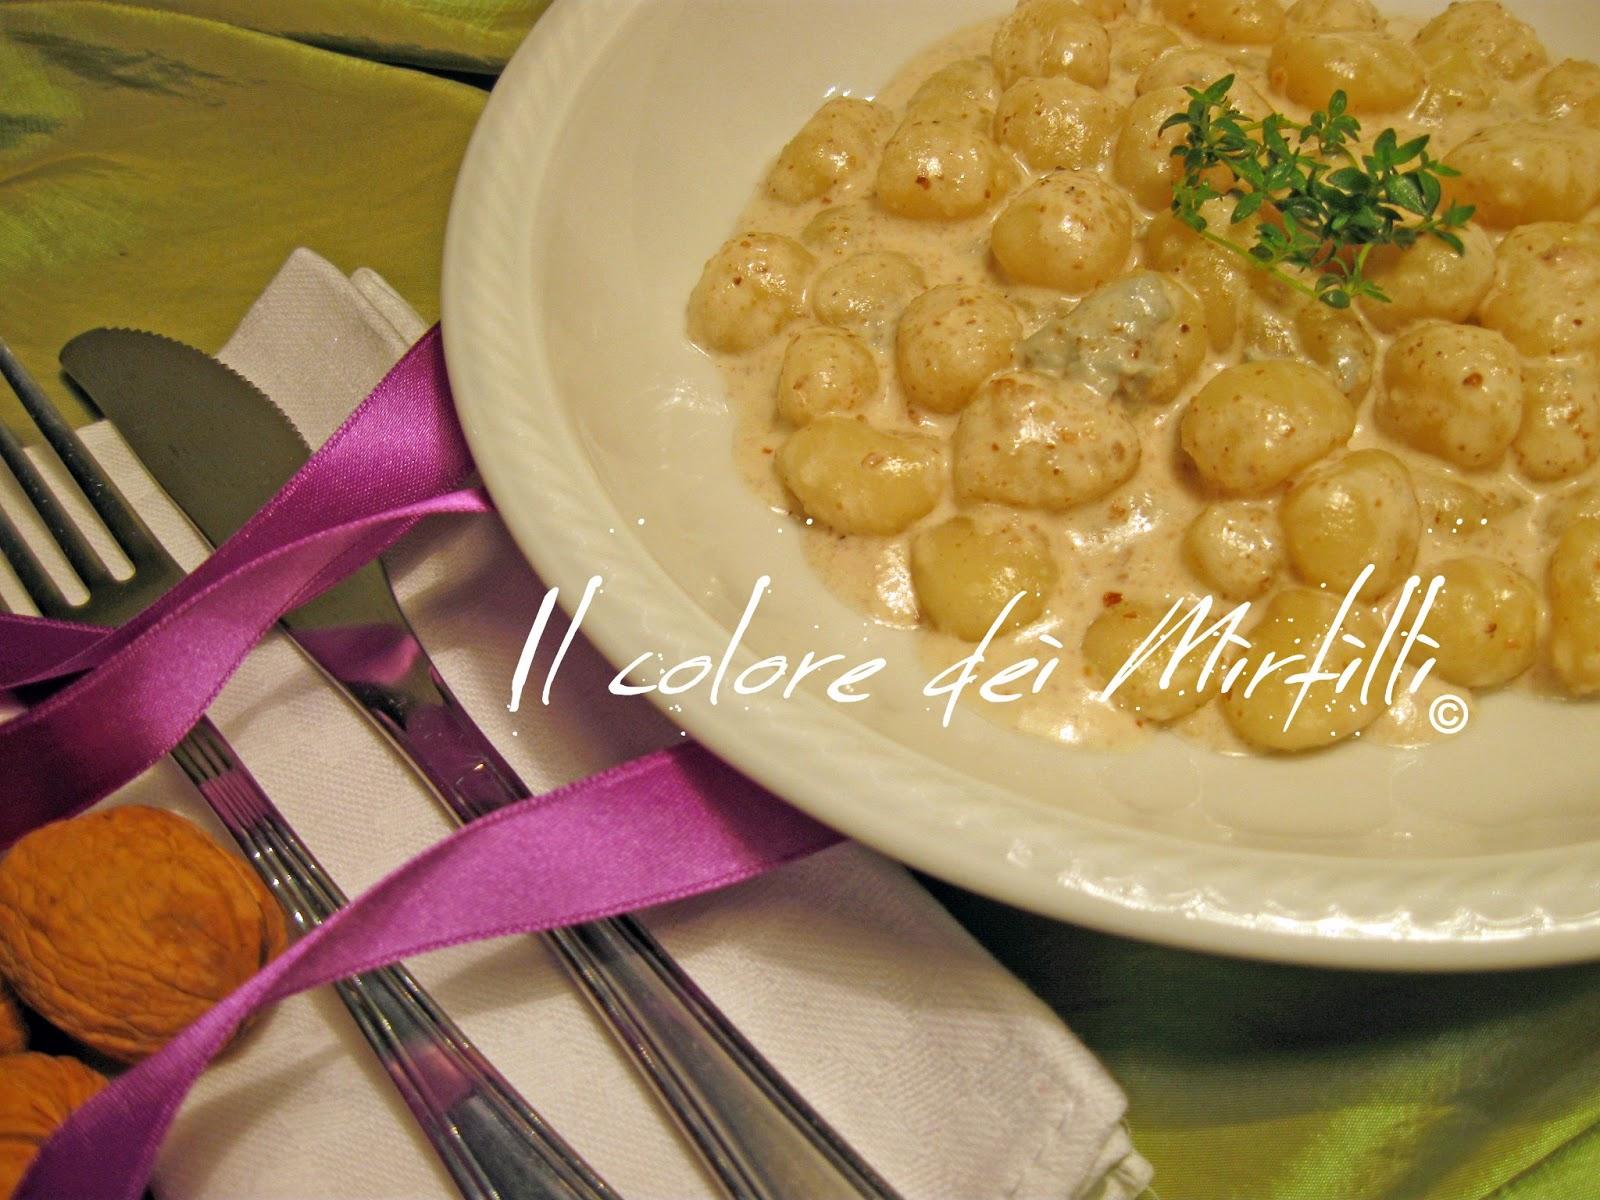 gnocchetti gorgonzola e noci,gnocchi,gnocchetti,gorgonzola,noci,primi piatti